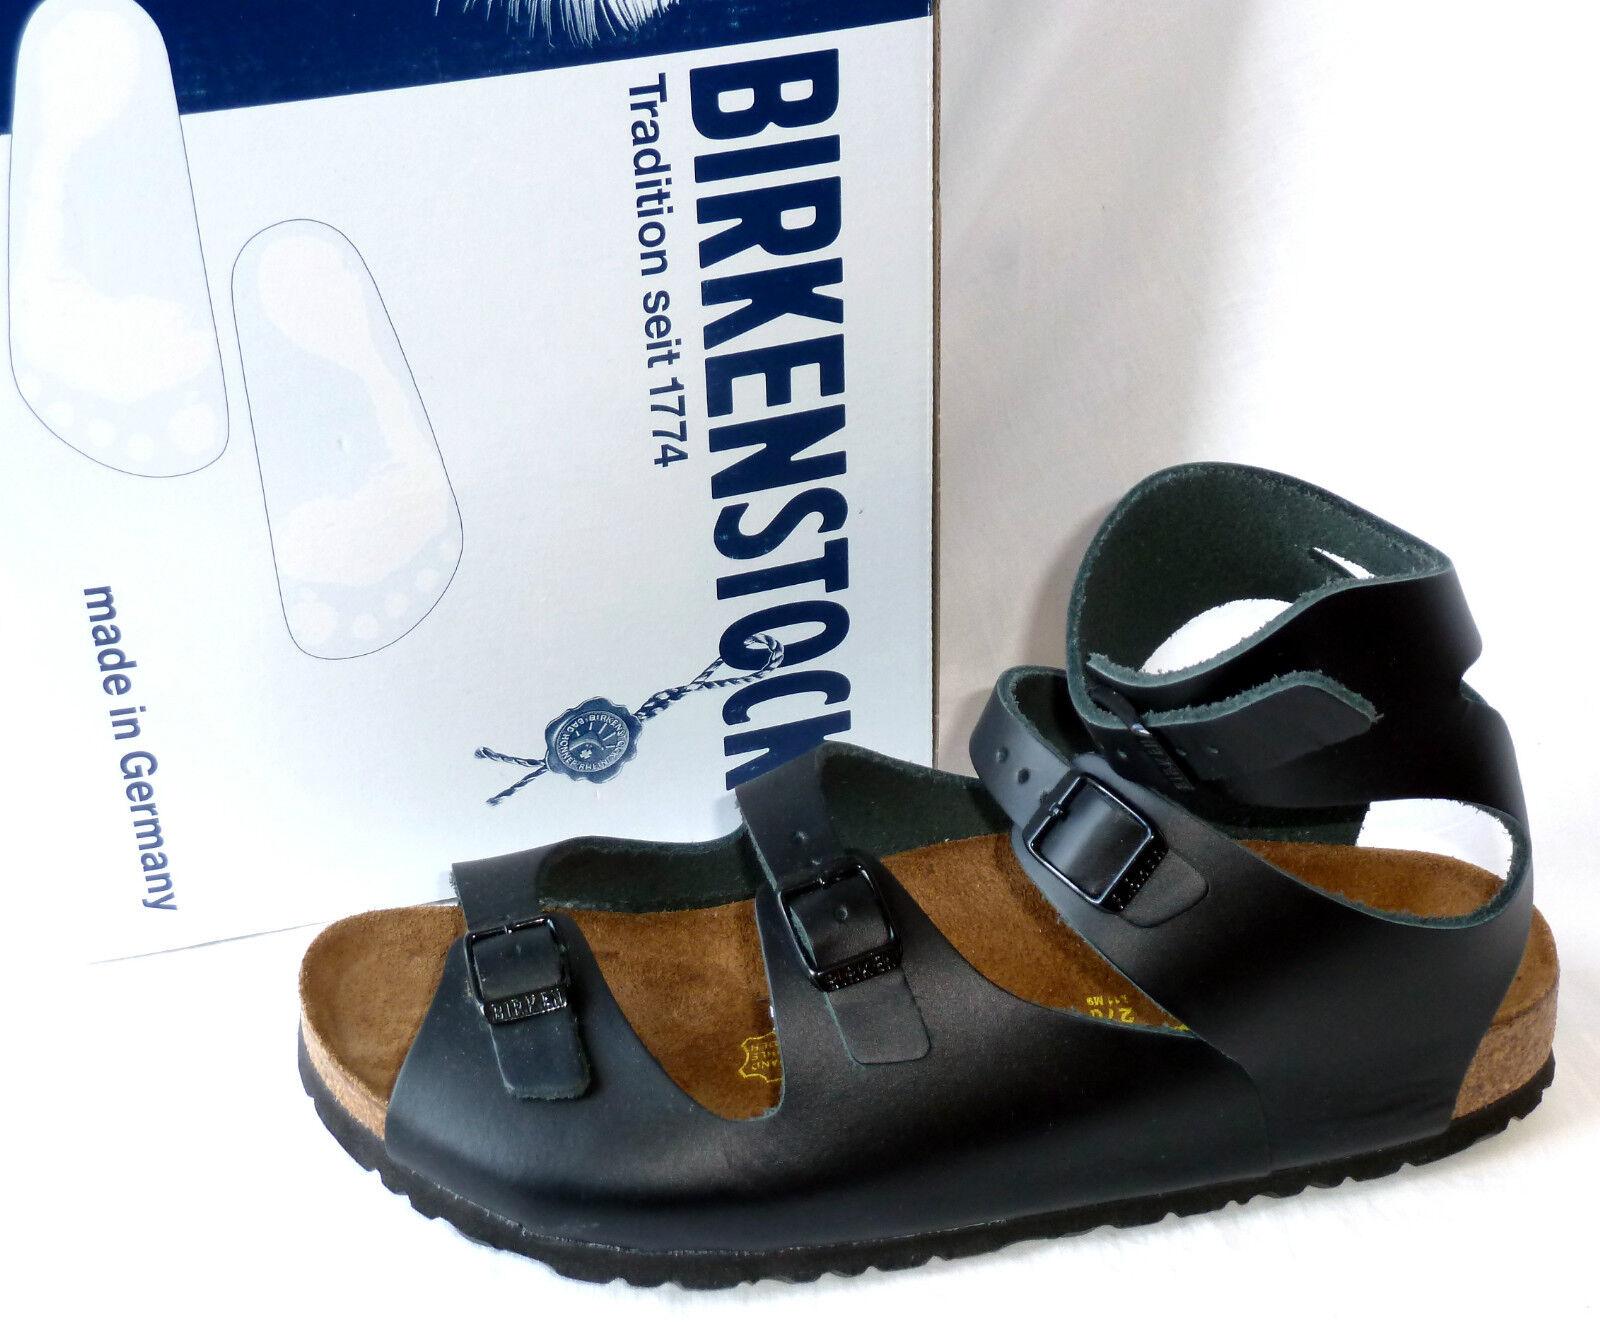 Birkenstock Unisex Leder Sandaleen ATHEN, Gr. 42, Leder, schwarz